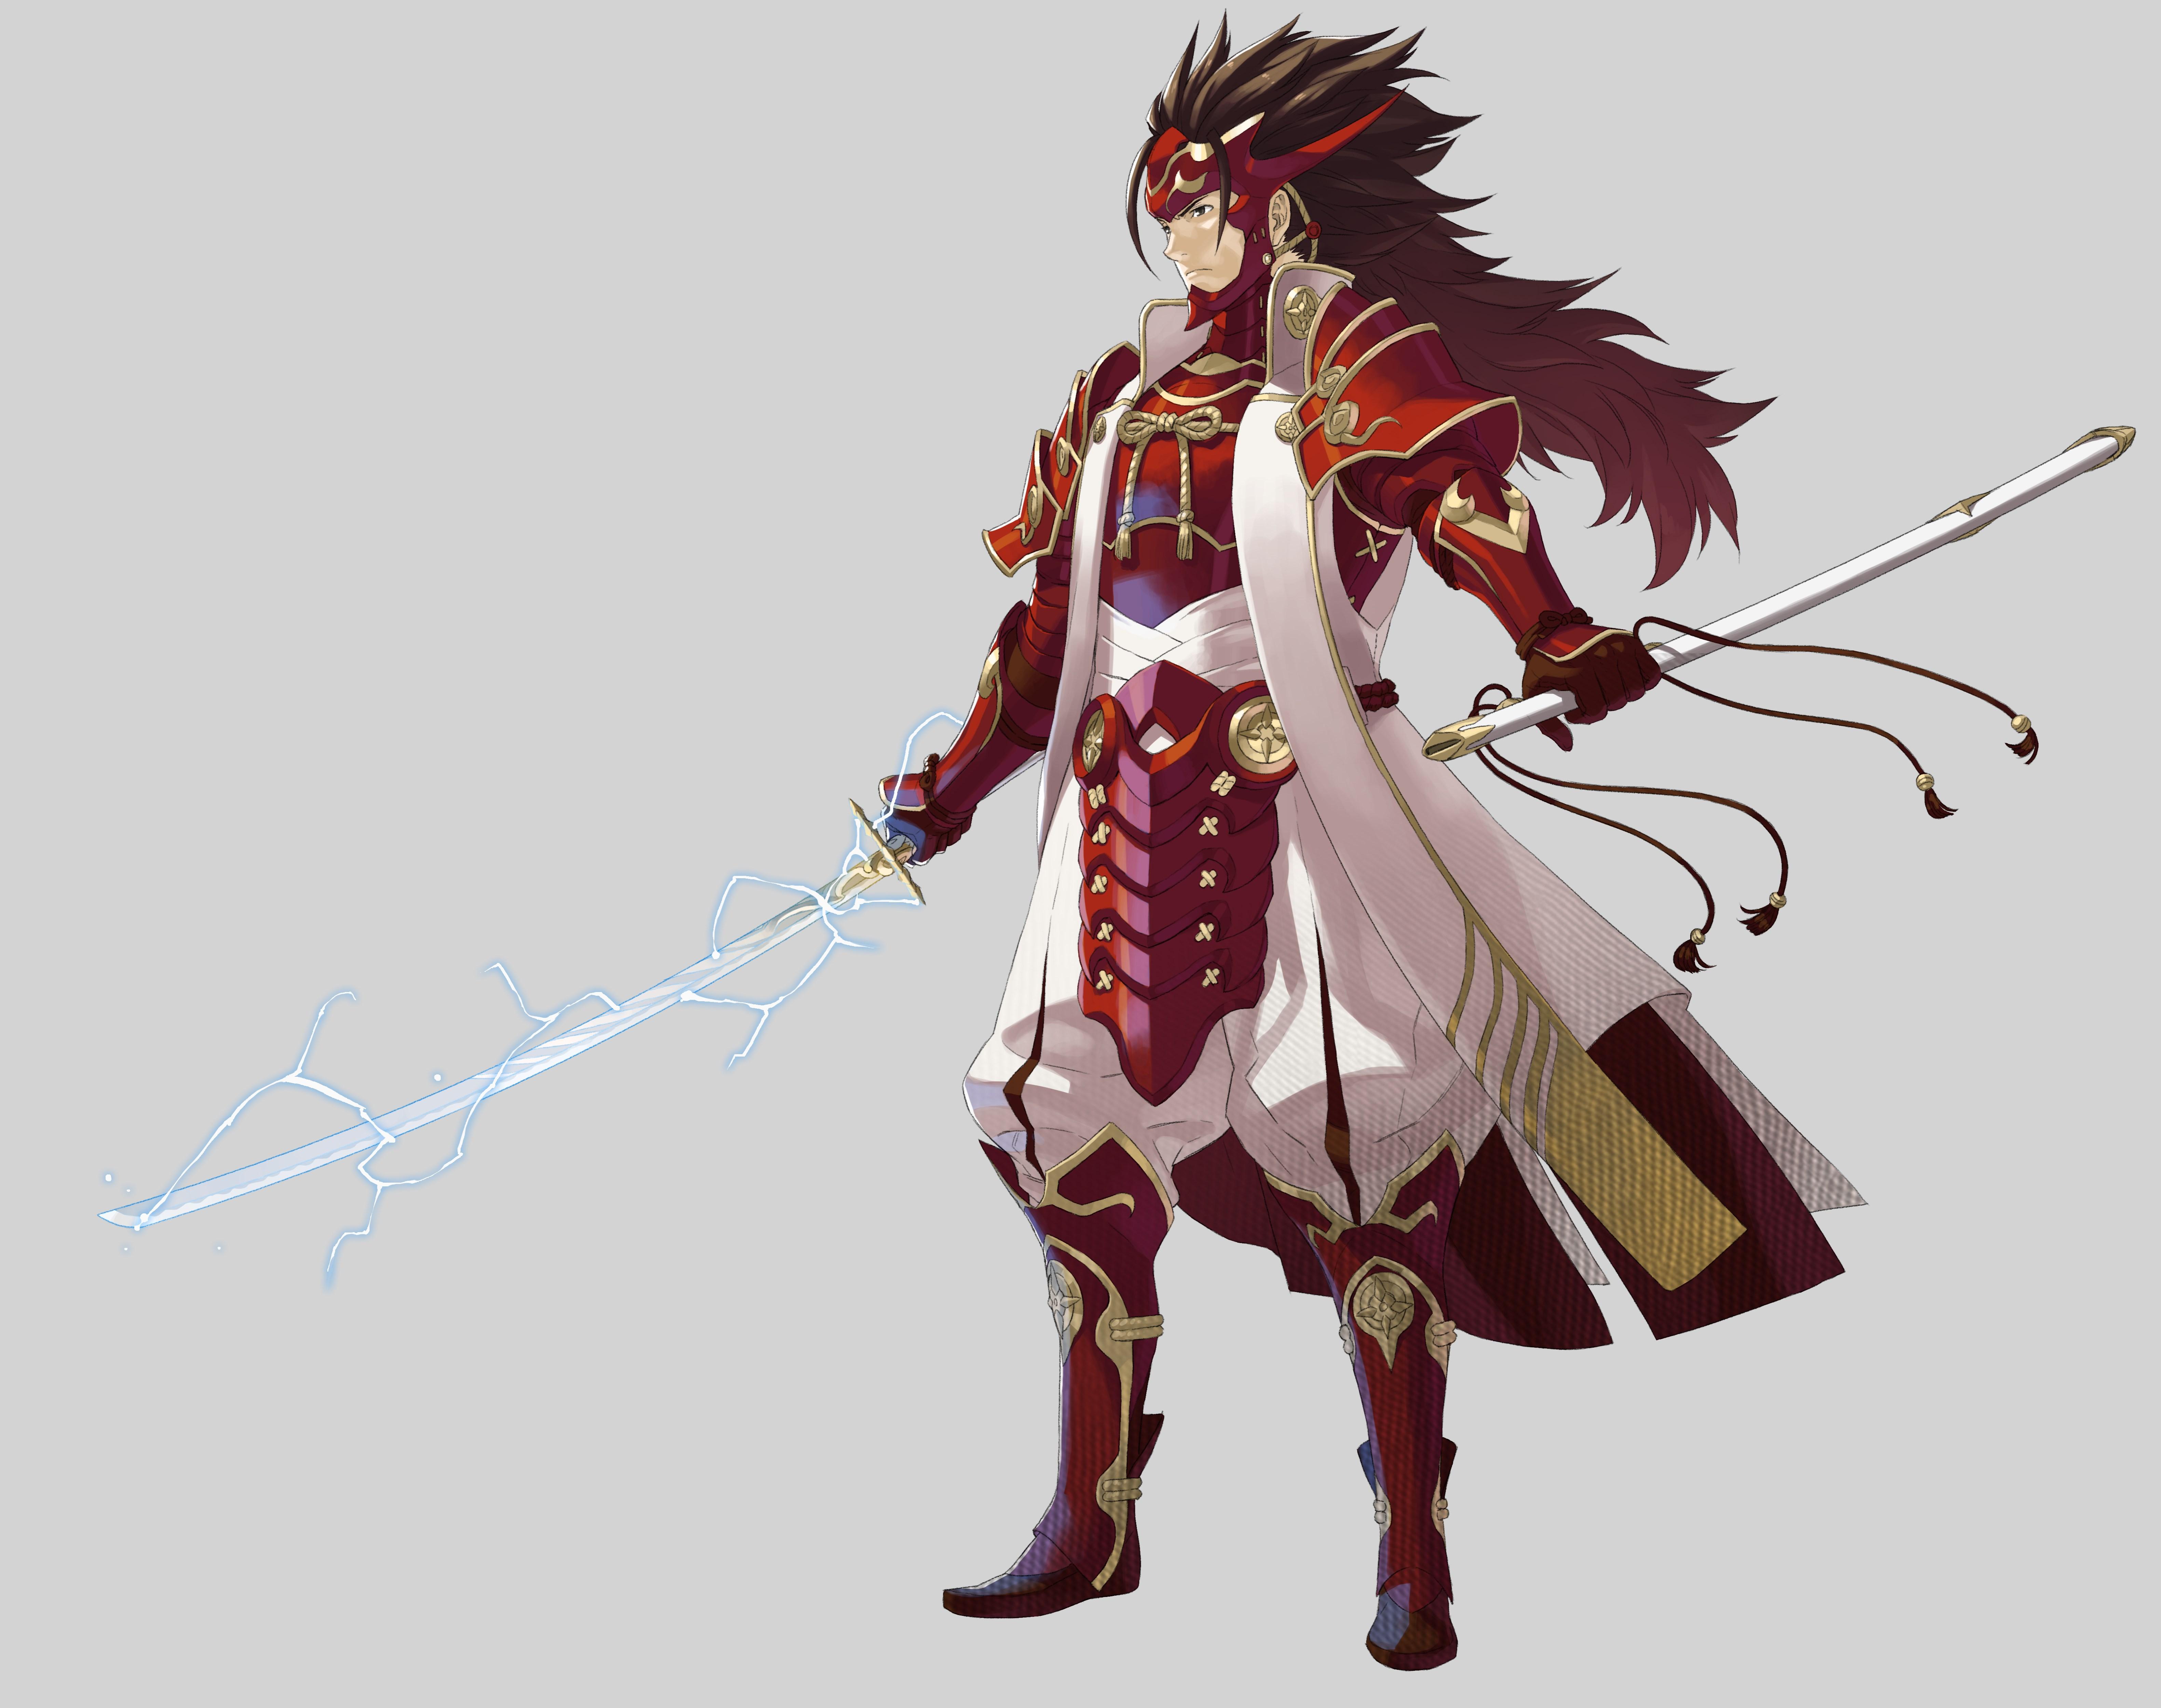 Fire Emblem Fates Wallpapers Video Game Hq Fire Emblem Fates